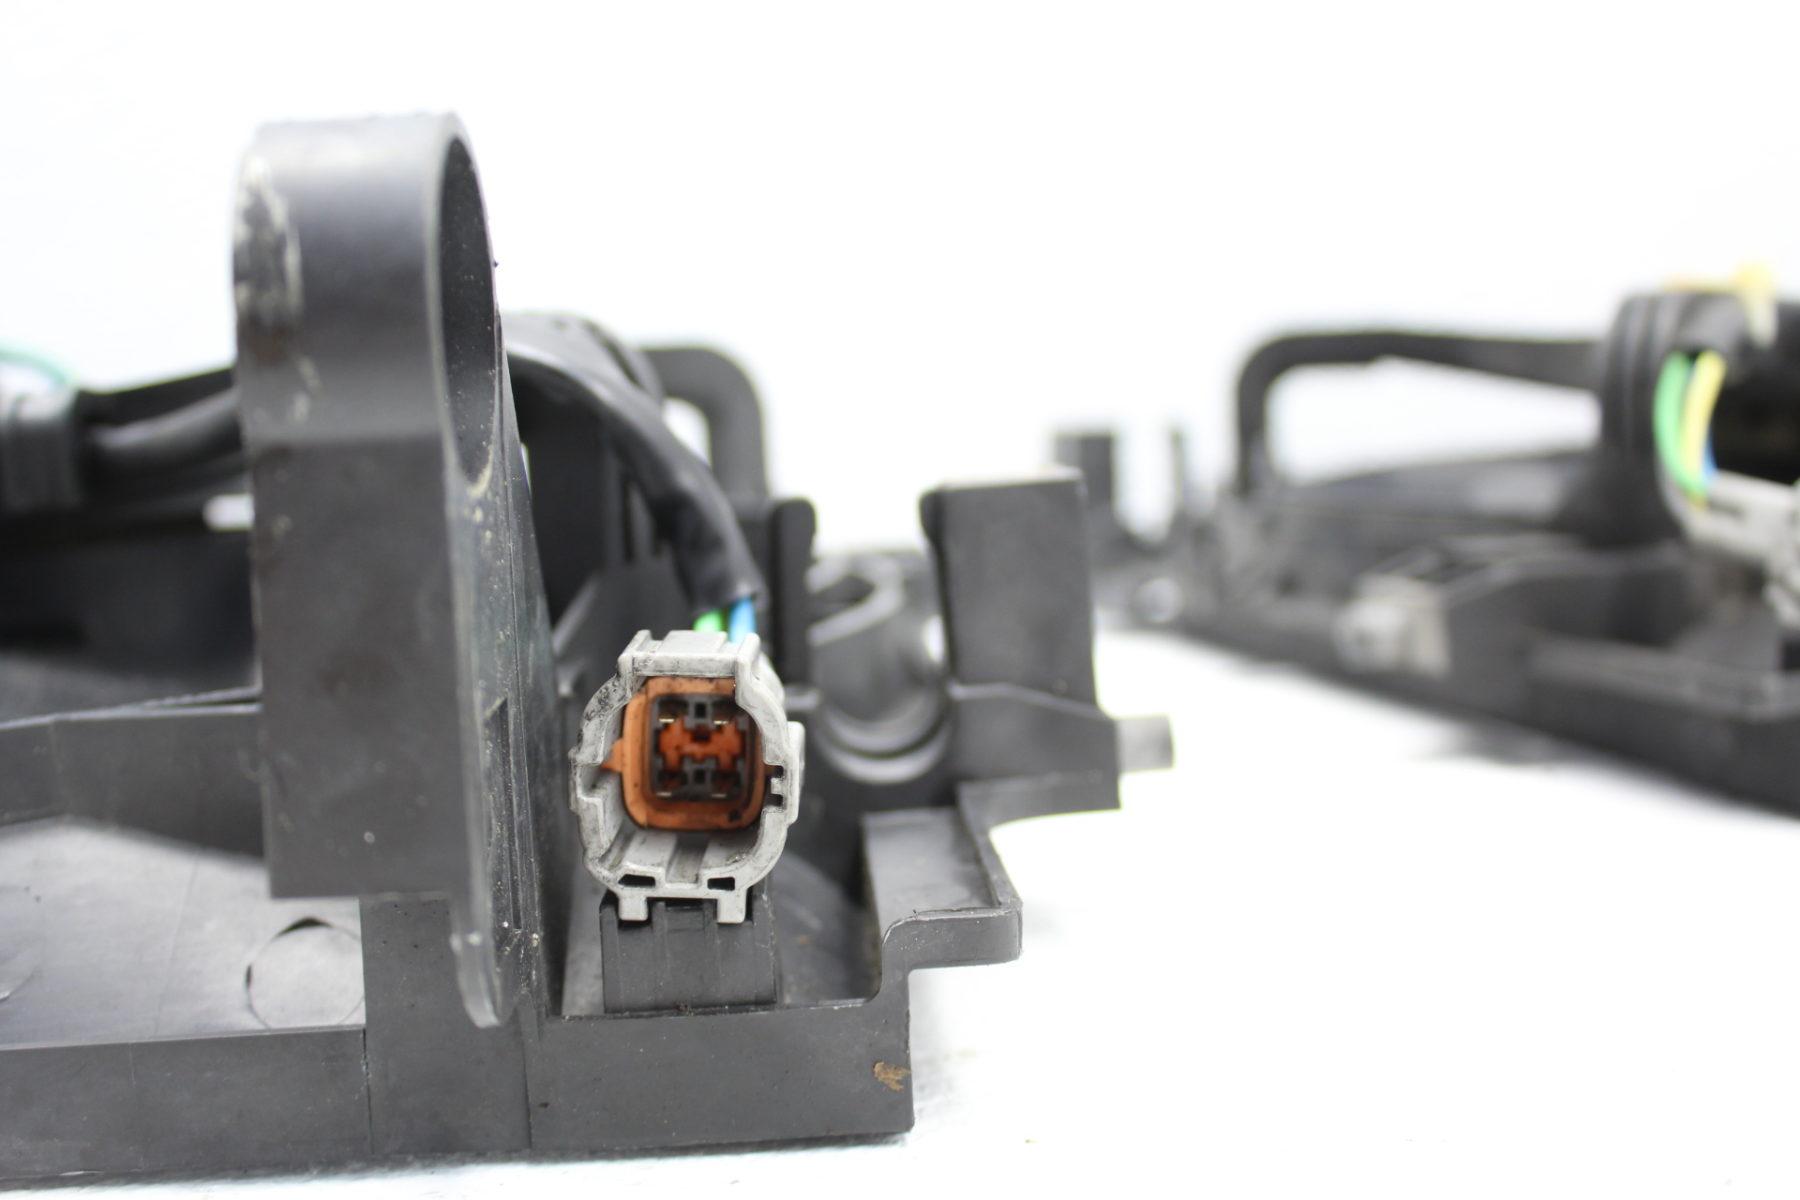 04-07 2004-2007 SUBARU WRX & STI ENGINE RADIATOR COOLING FAN ASSEMBLY SET